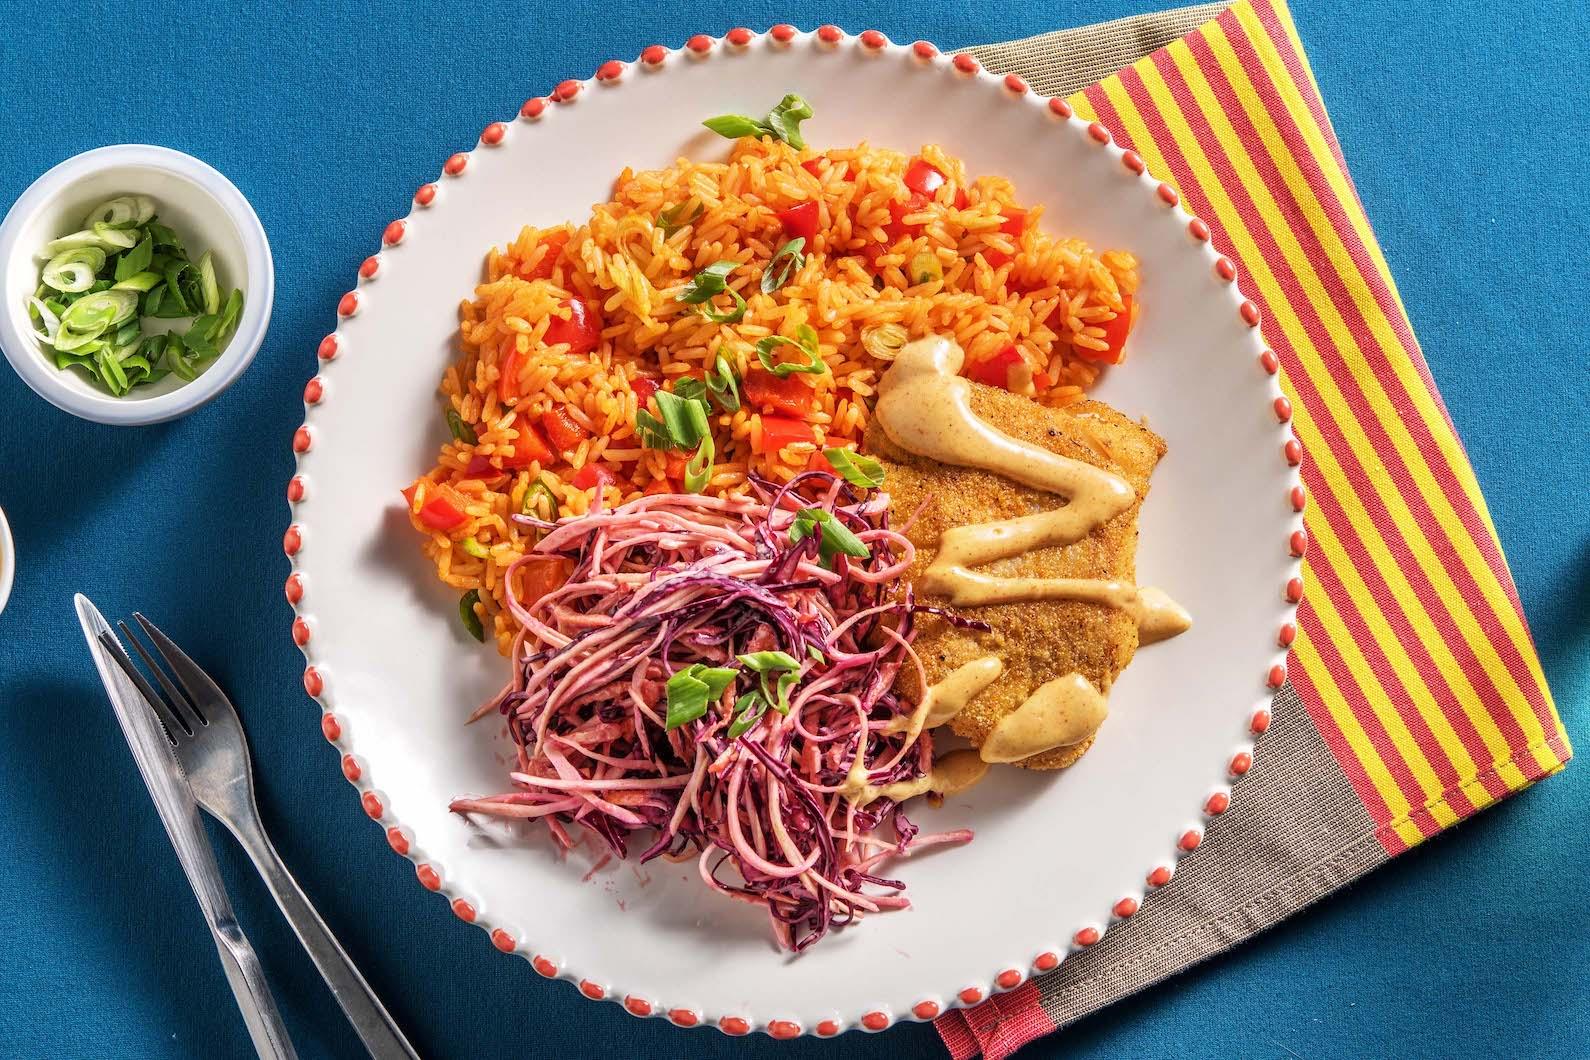 Cajun Haddock with rice pilaf and smoky remoulade sauce,